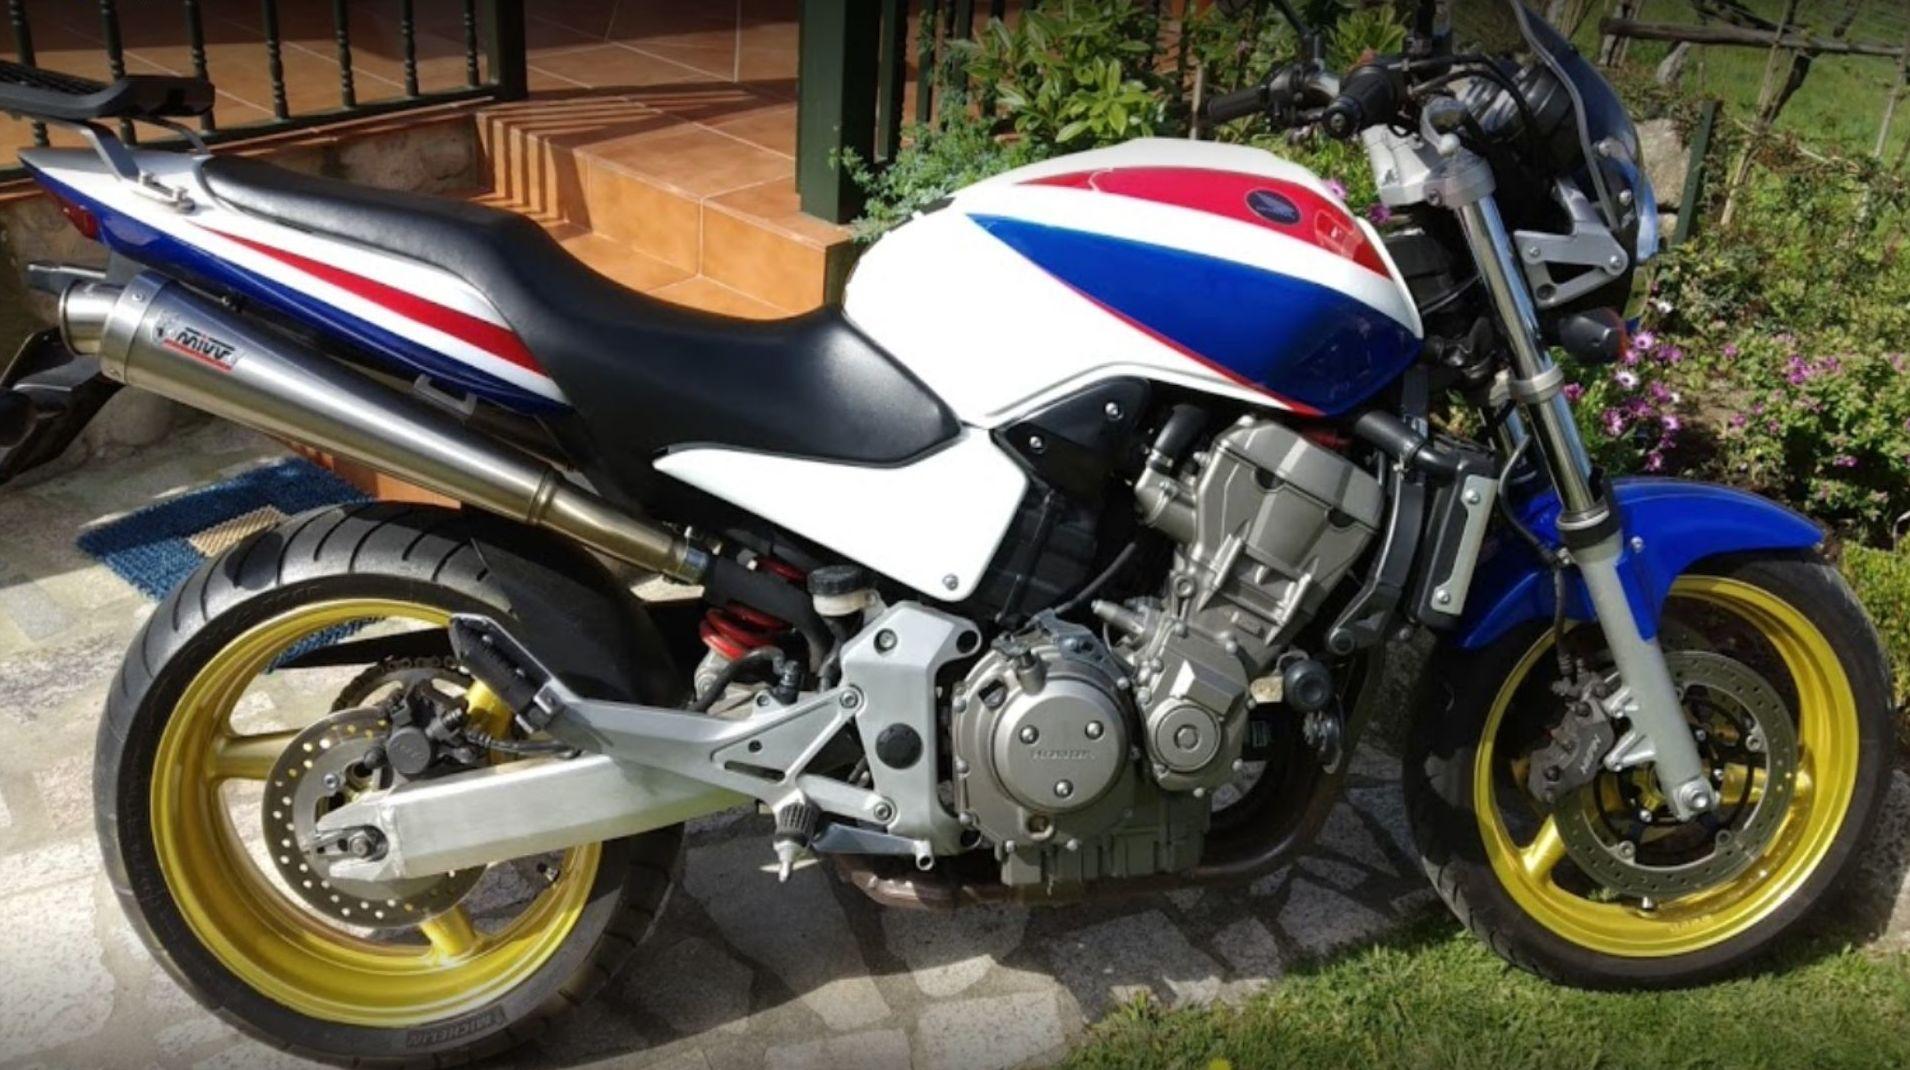 Foto 1 de Motos en Vigo | Moto 2